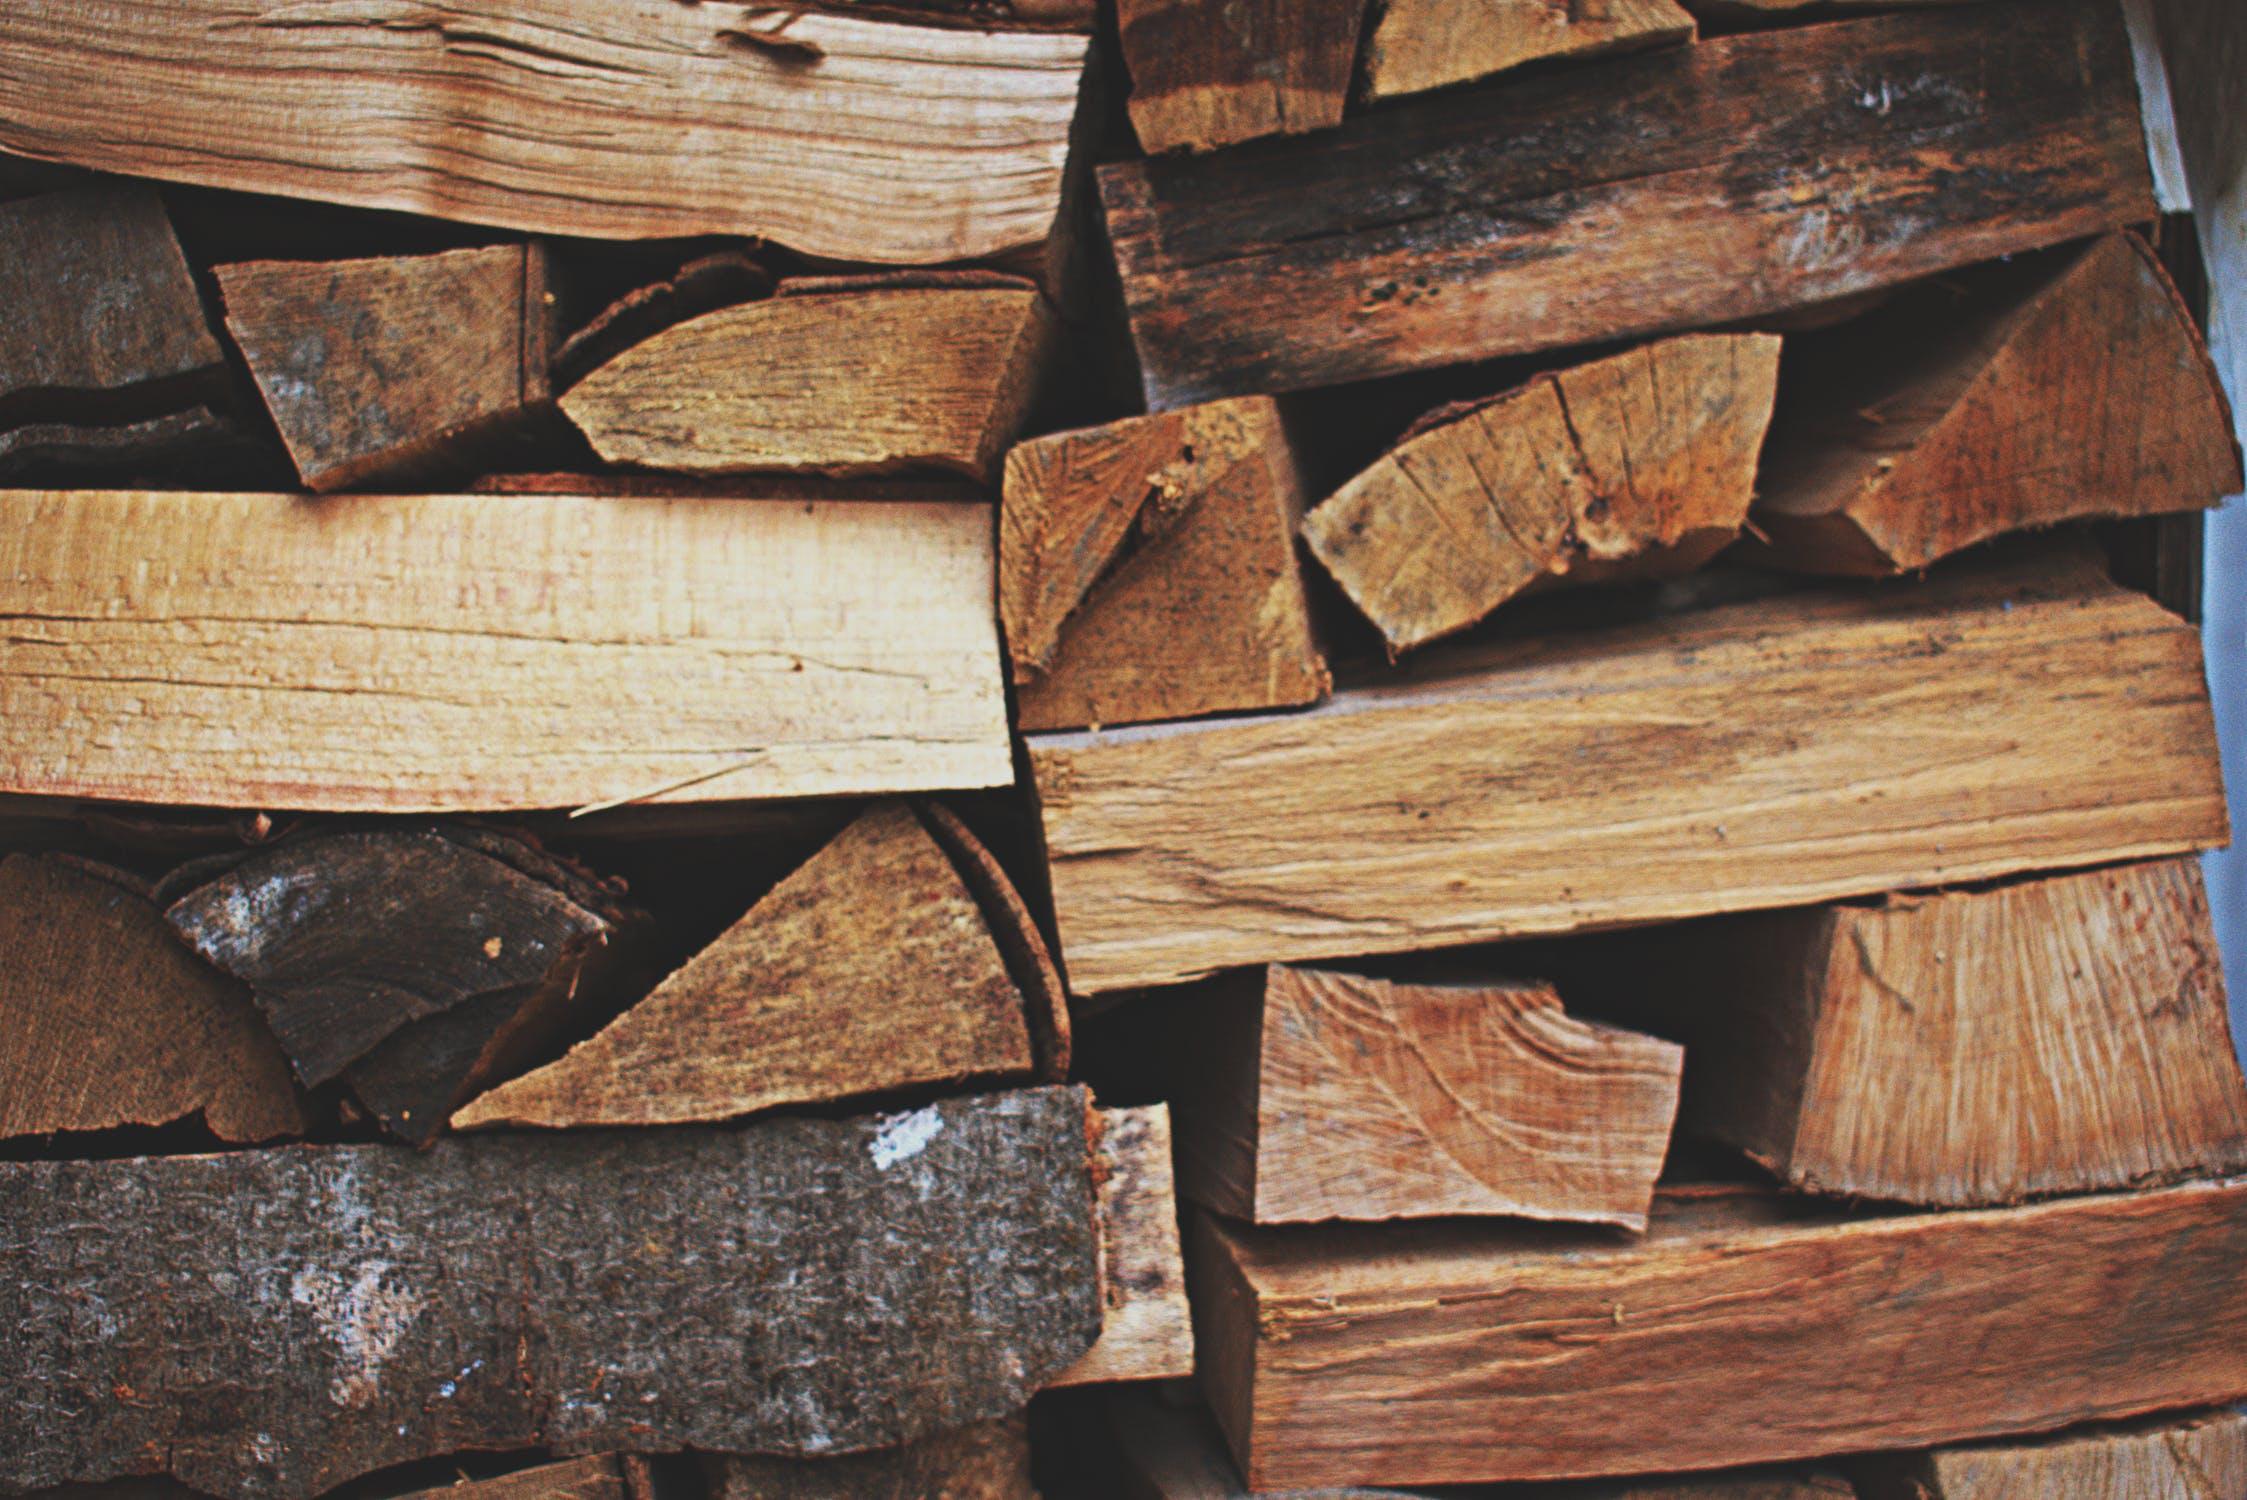 Kiln-Dried Firewood in Buford, GA